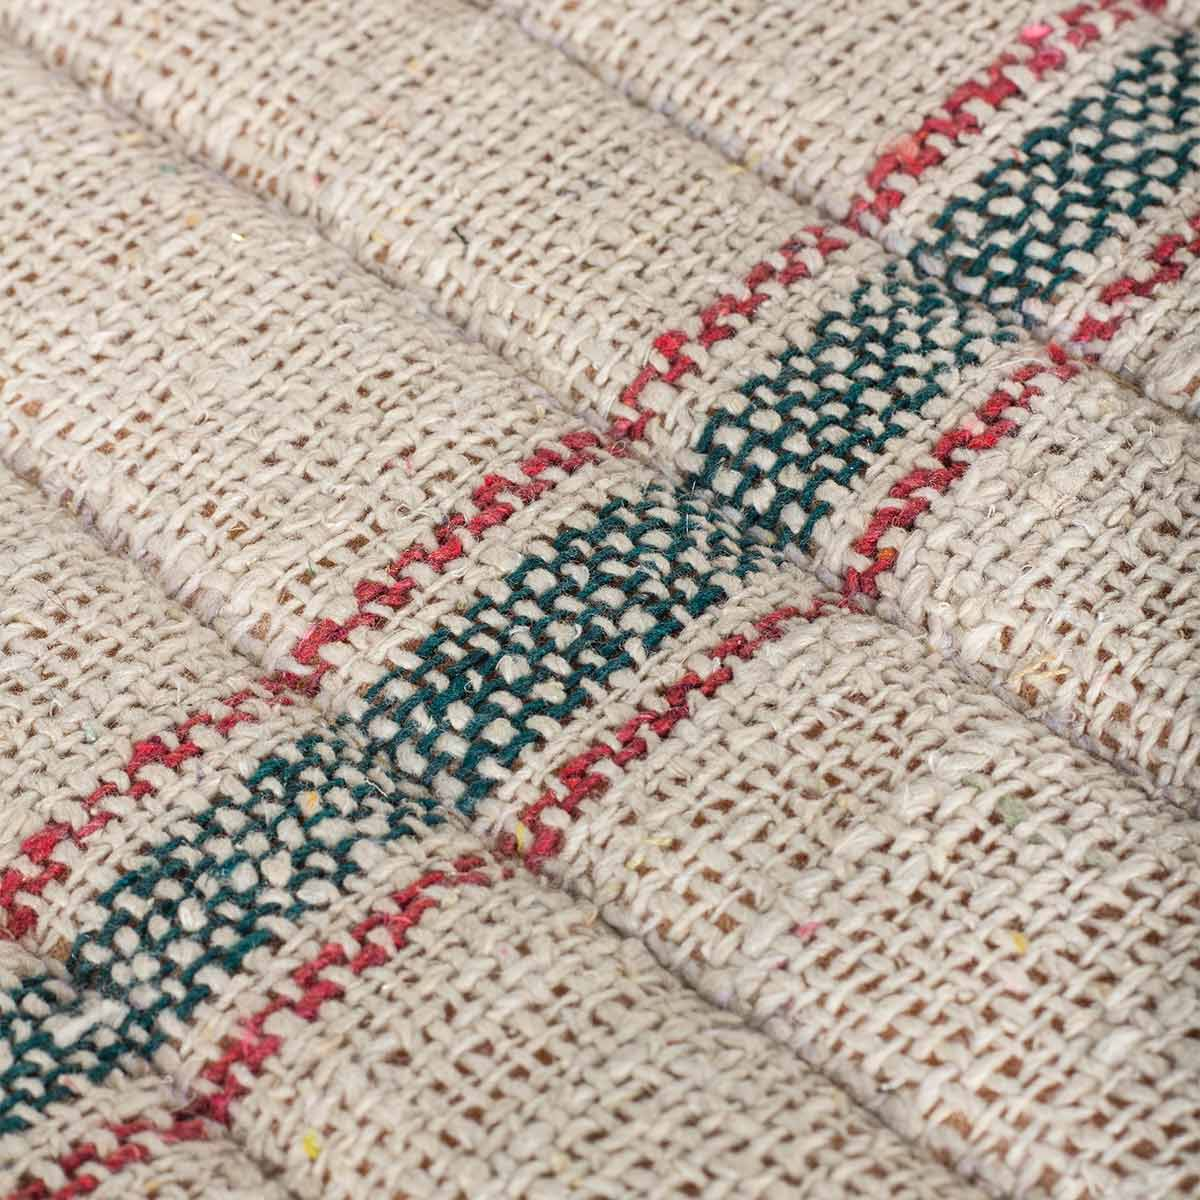 Sillas tapizadas de estilo vintage.